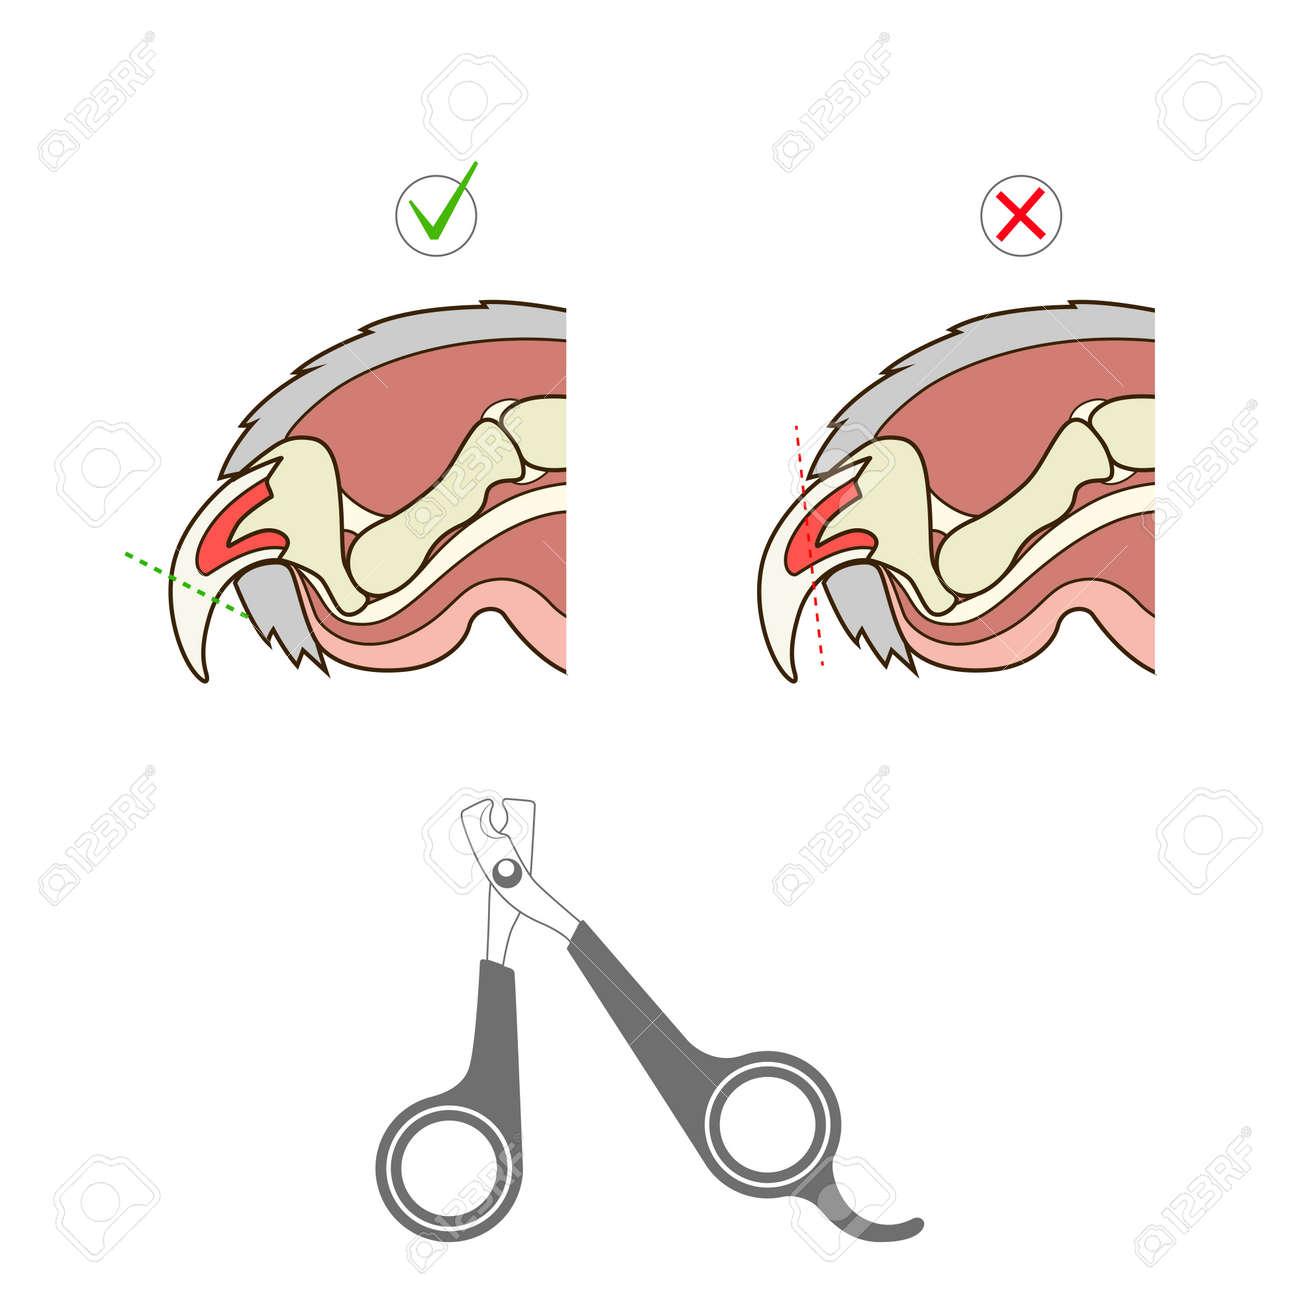 How To Cut Cat Nail Veterinary Medicine Instruction Vector